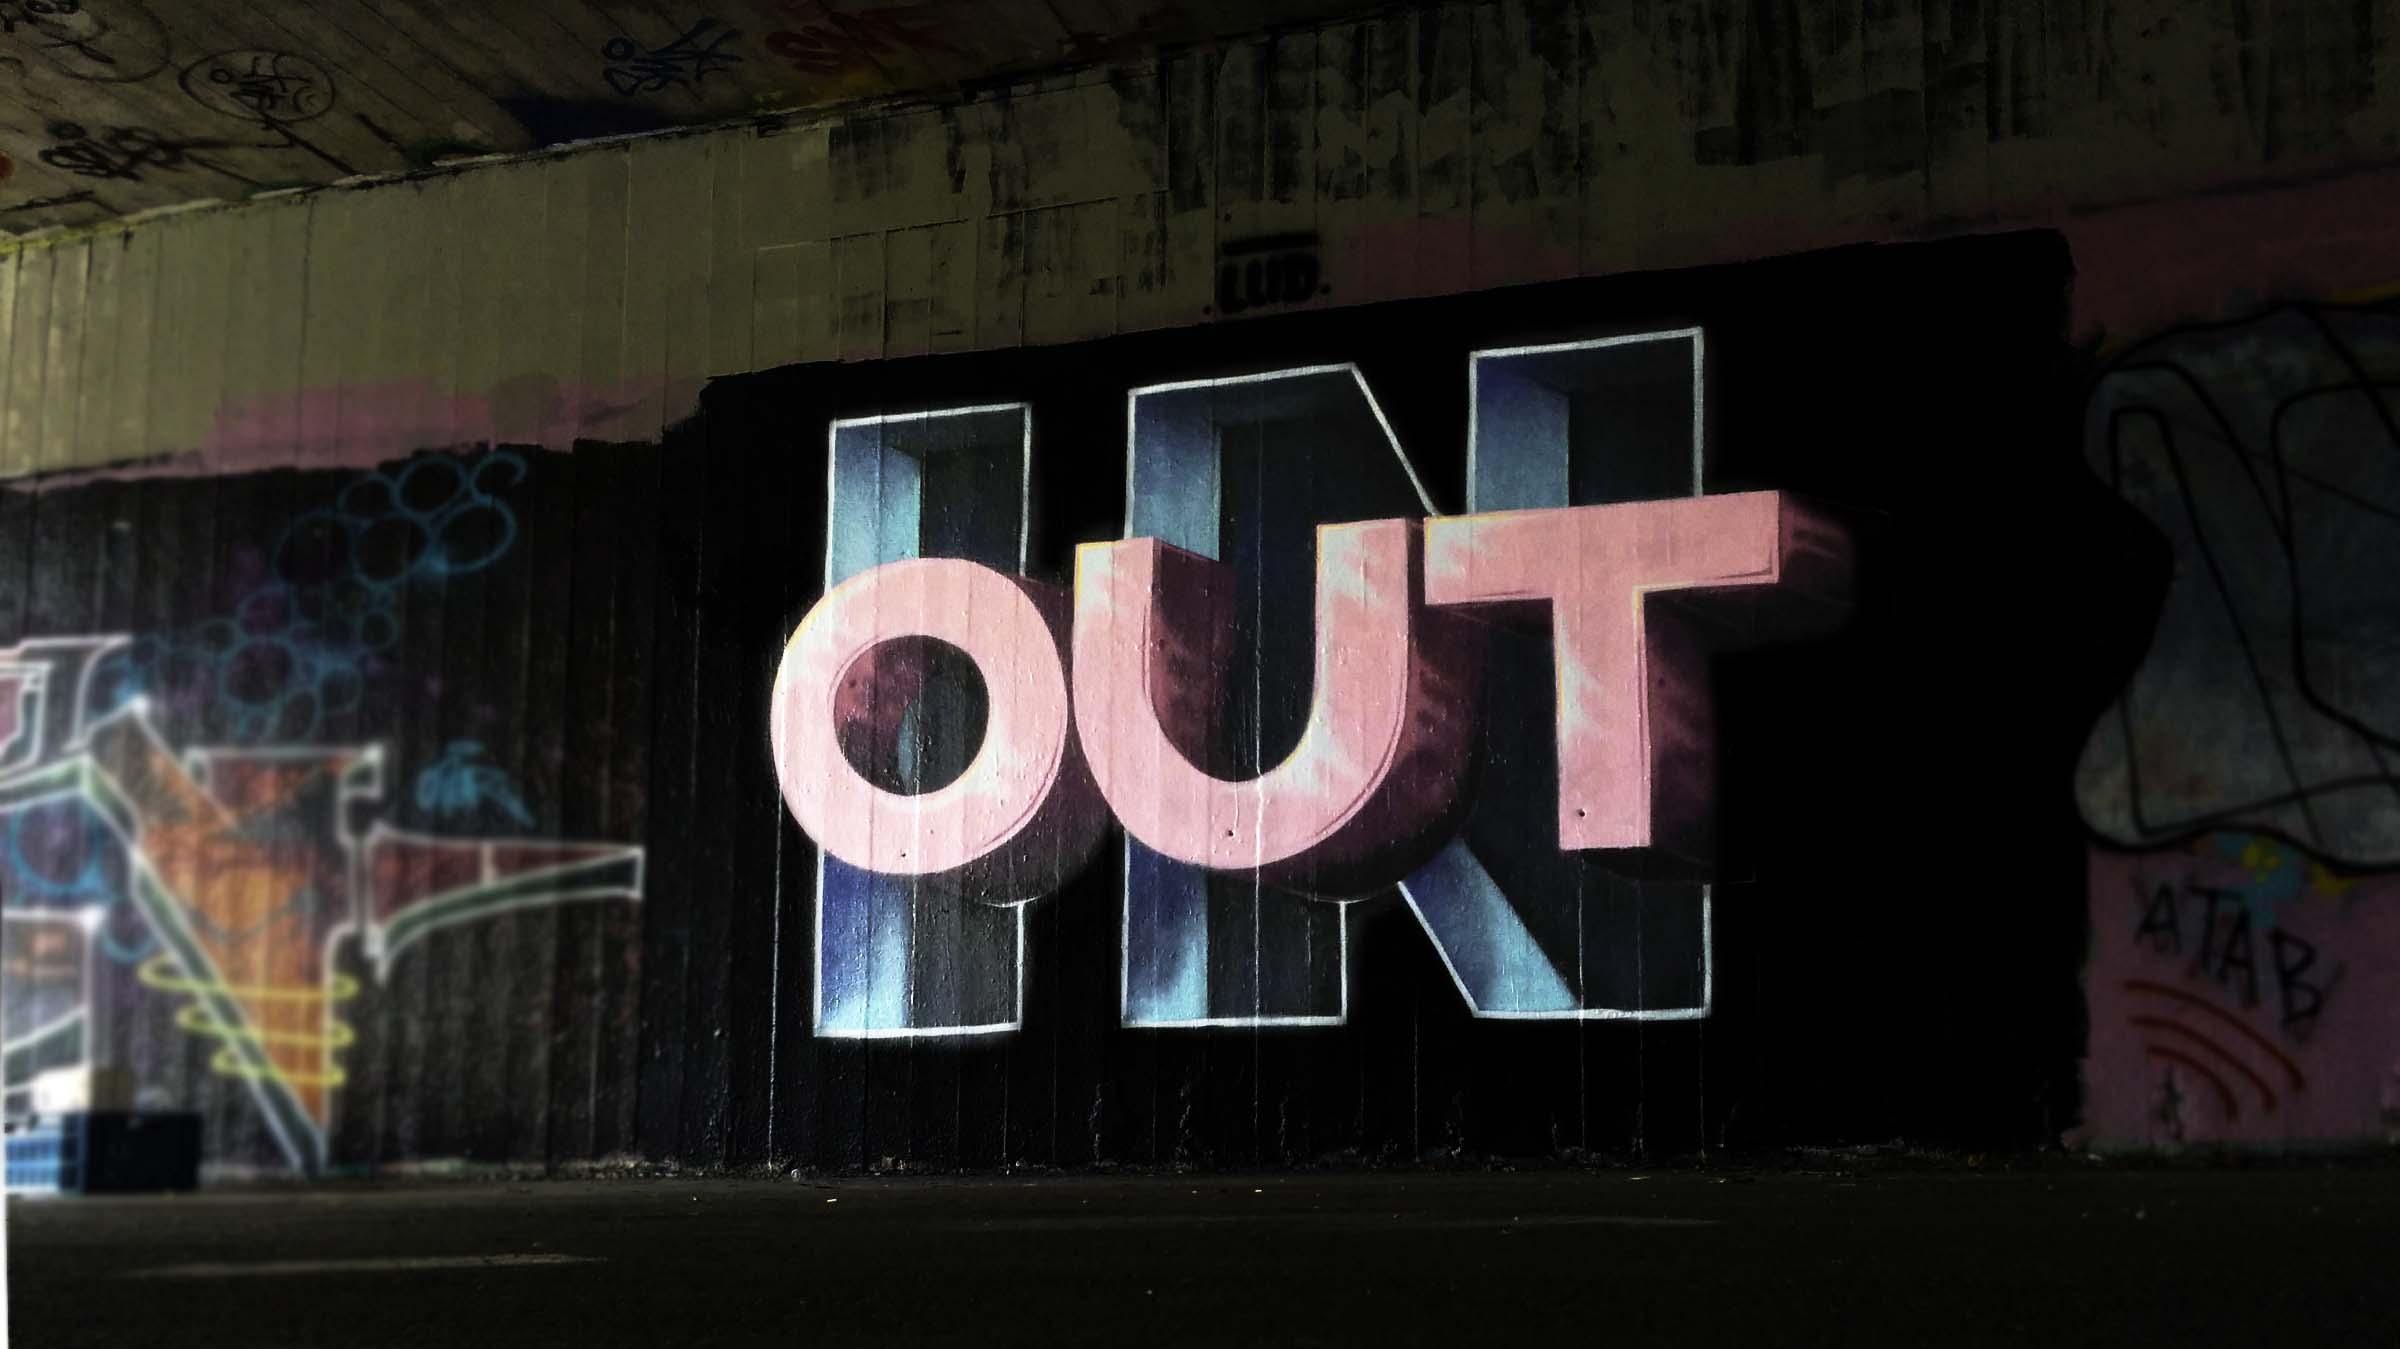 street art graffiti fresque trompe l'oeil anamorphose